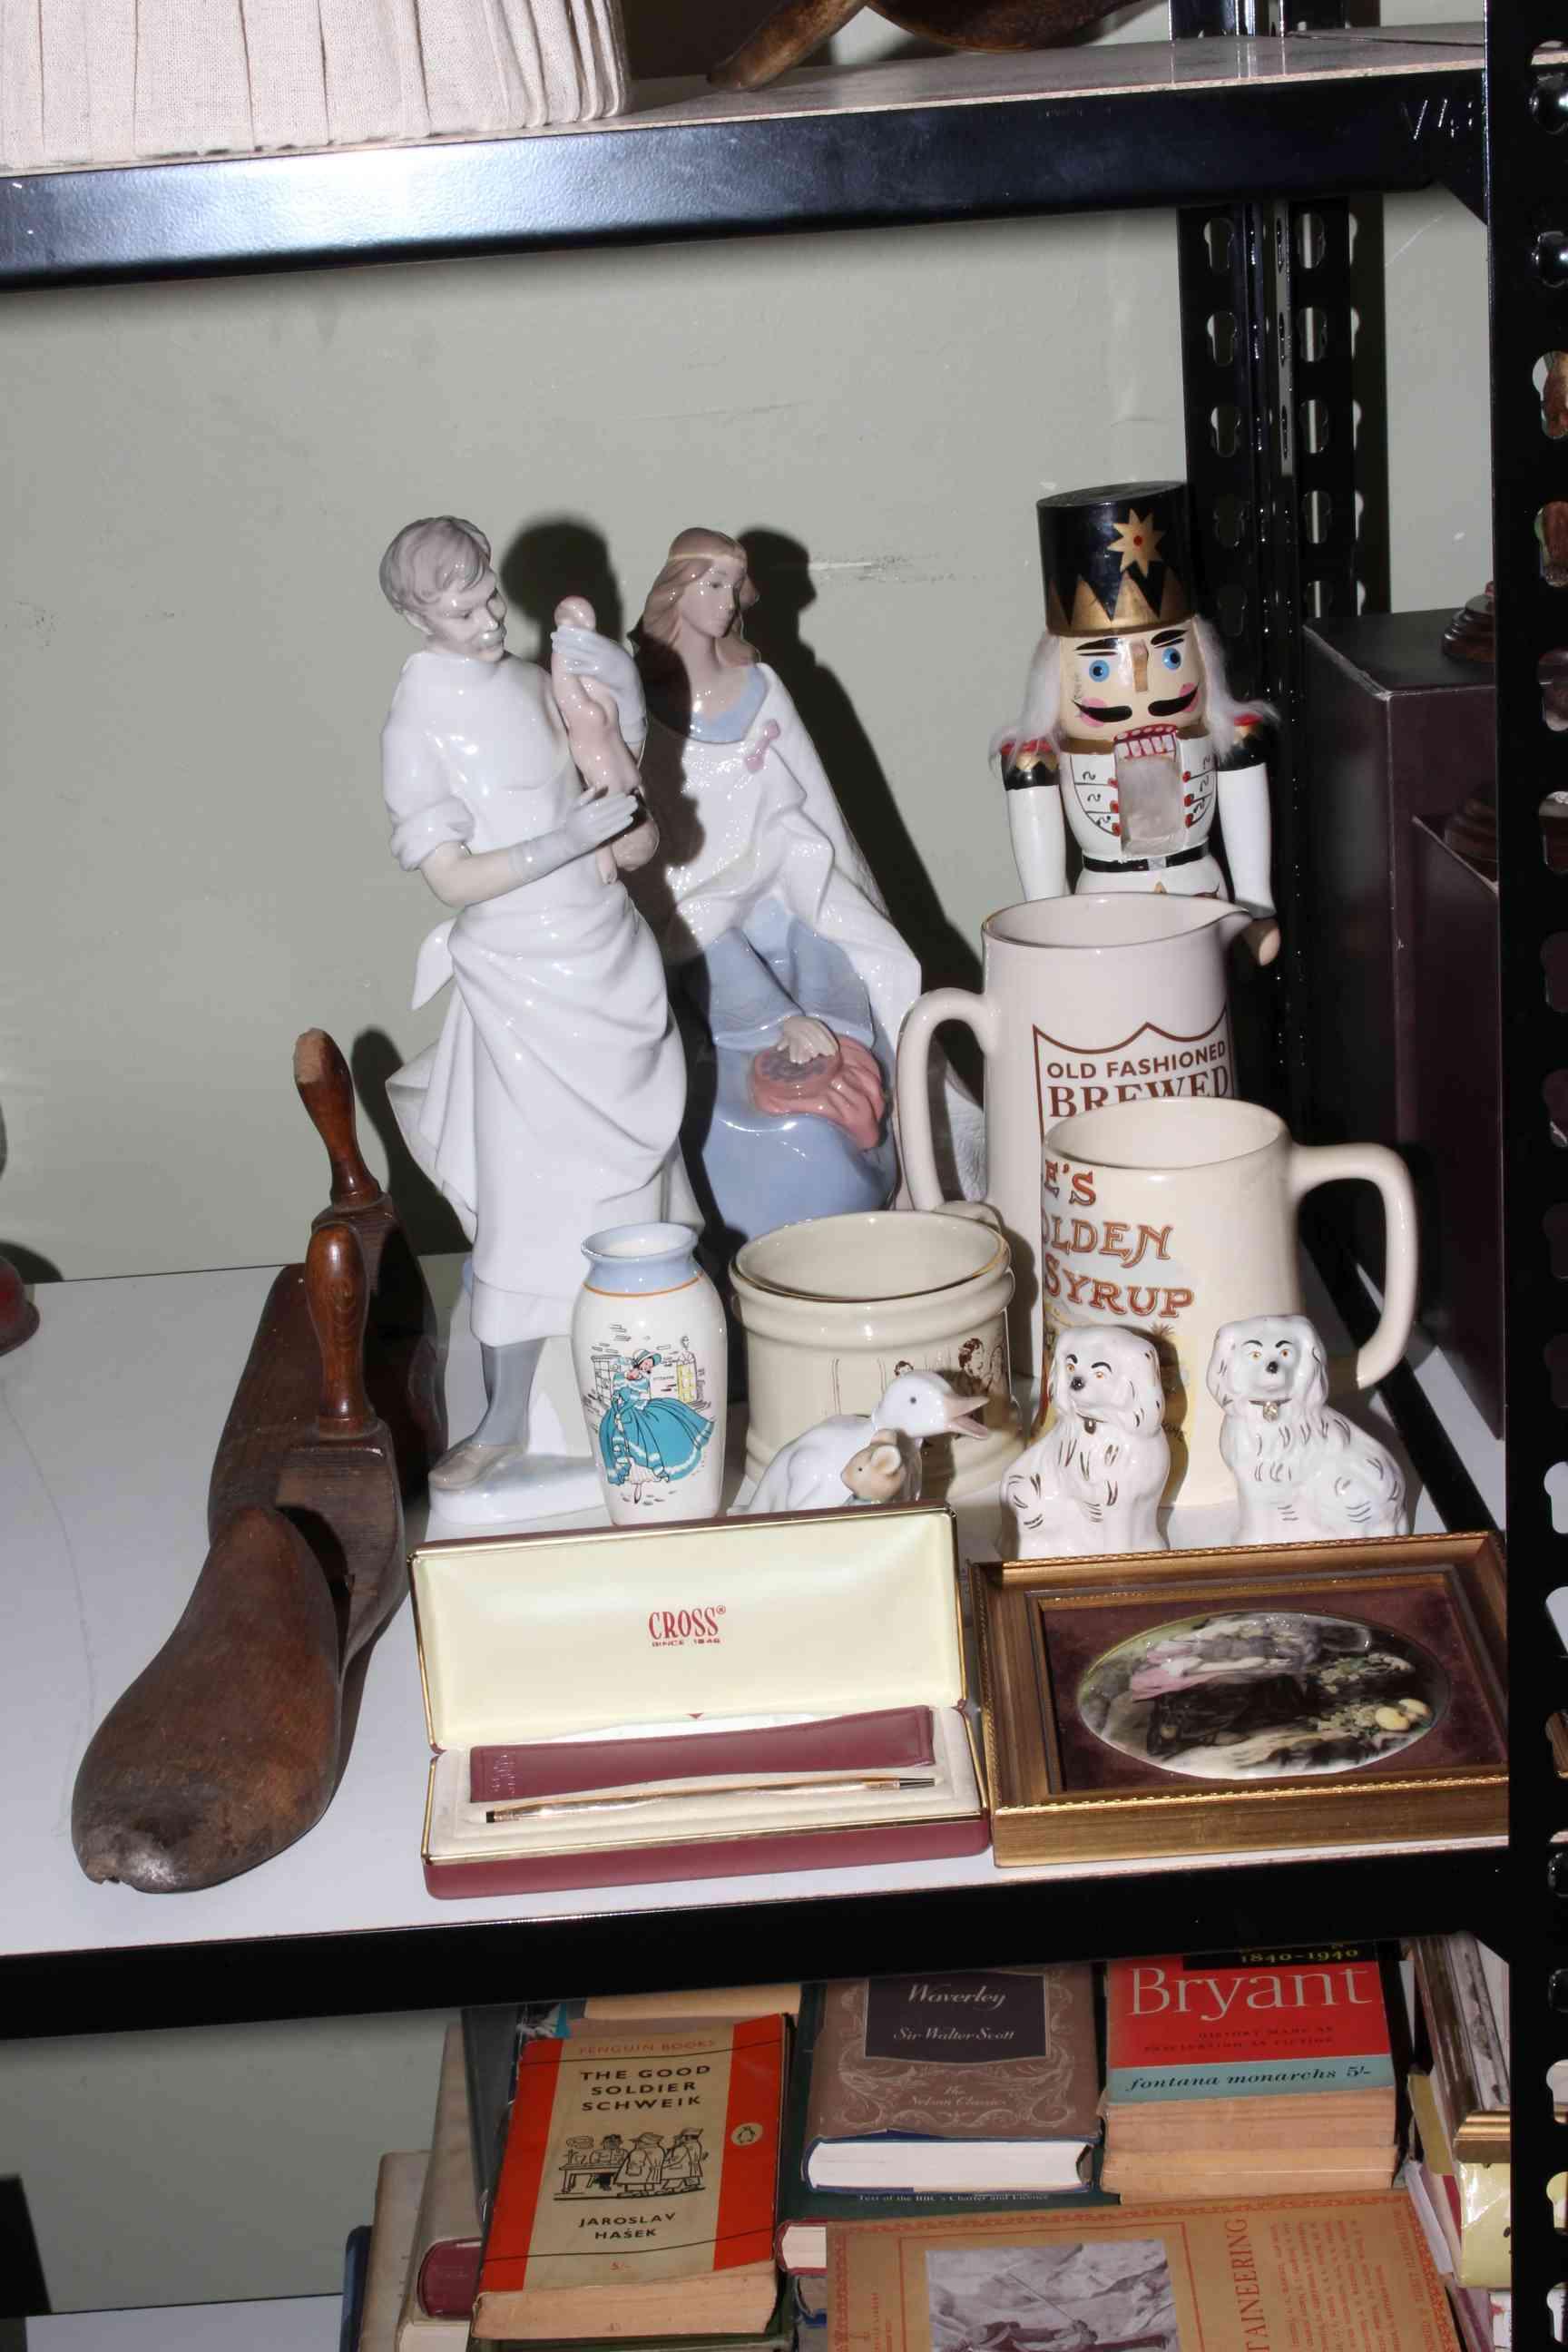 Lot 69 - Wooden shoe shapers, Nao and Lladro figurines, Wade, cross pen, etc.